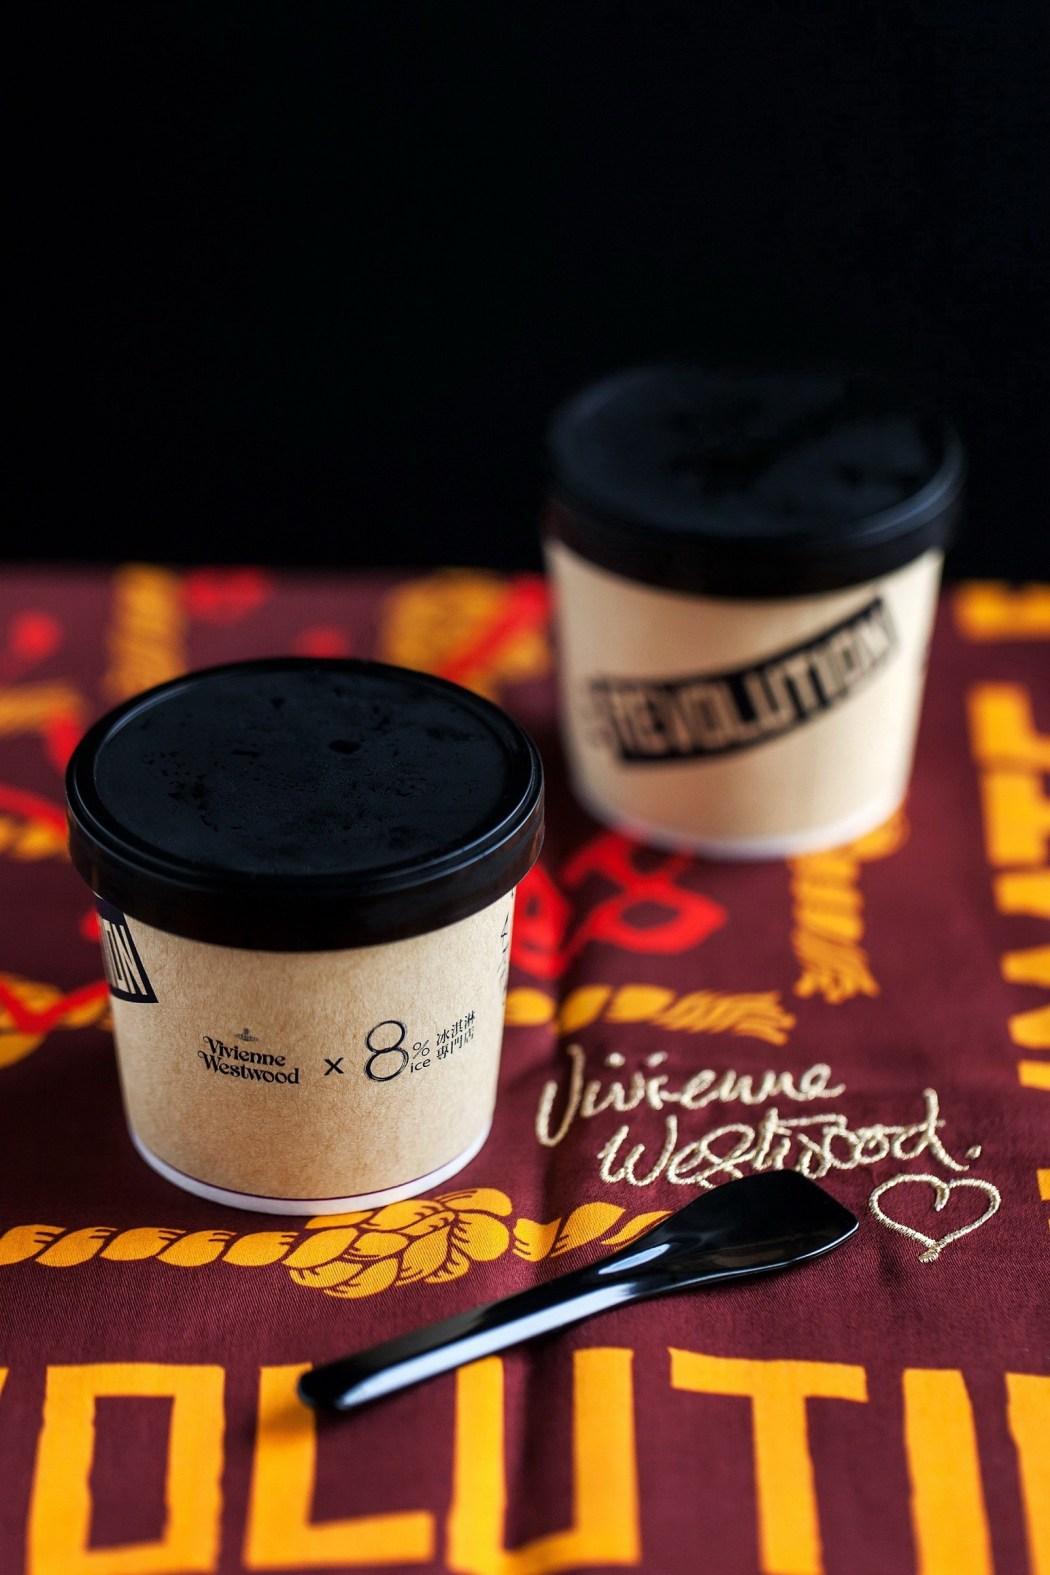 Vivienne Westwood X 8%ice 限量冰淇淋